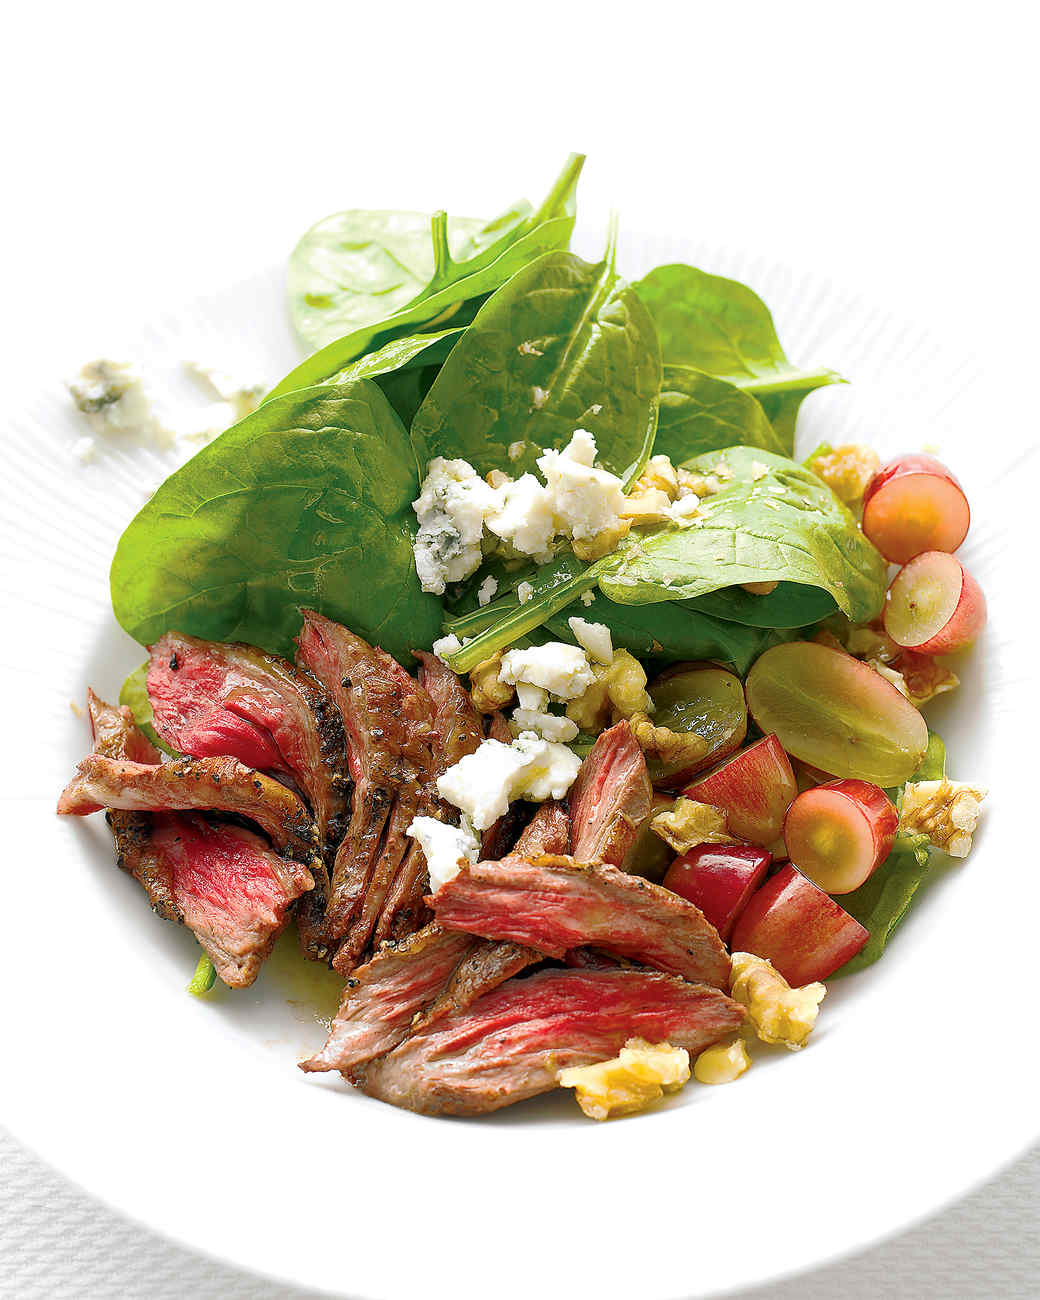 Steak Salad with Spinach